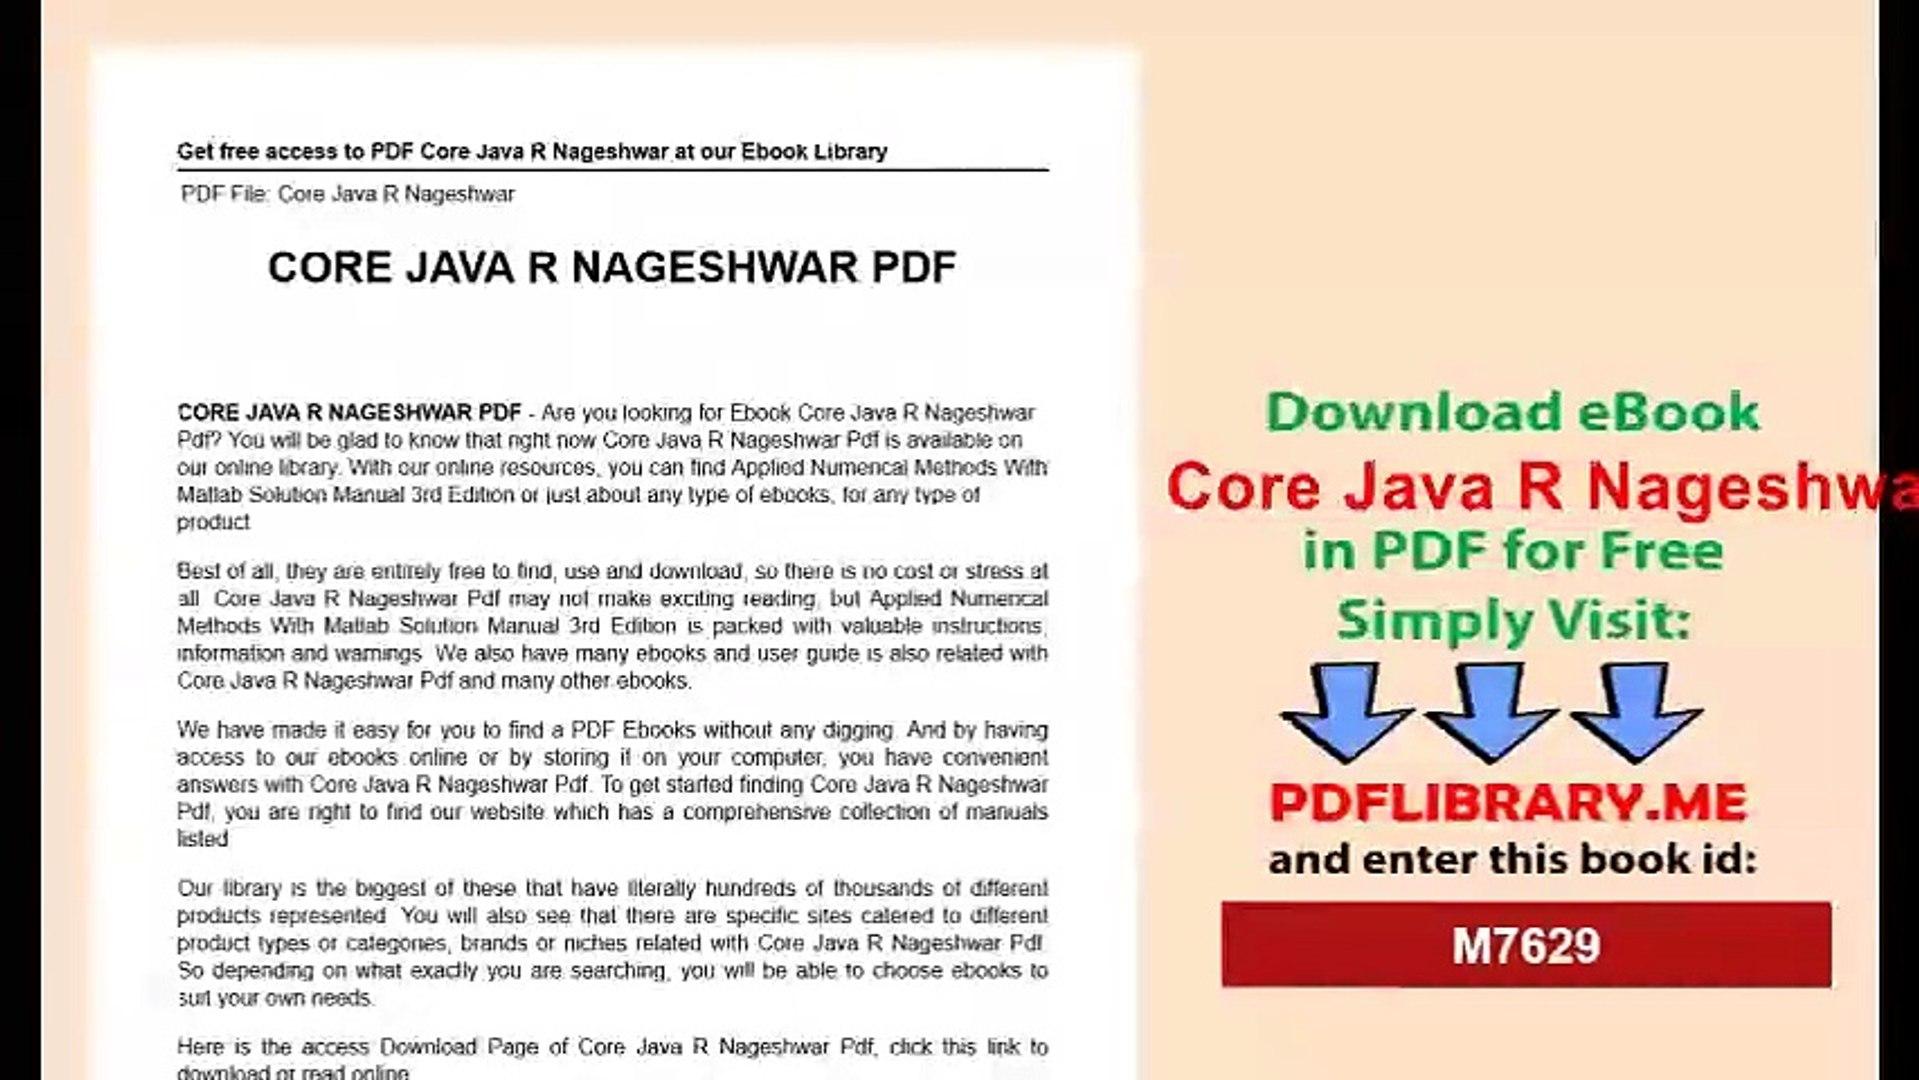 Core Java R Nageshwar